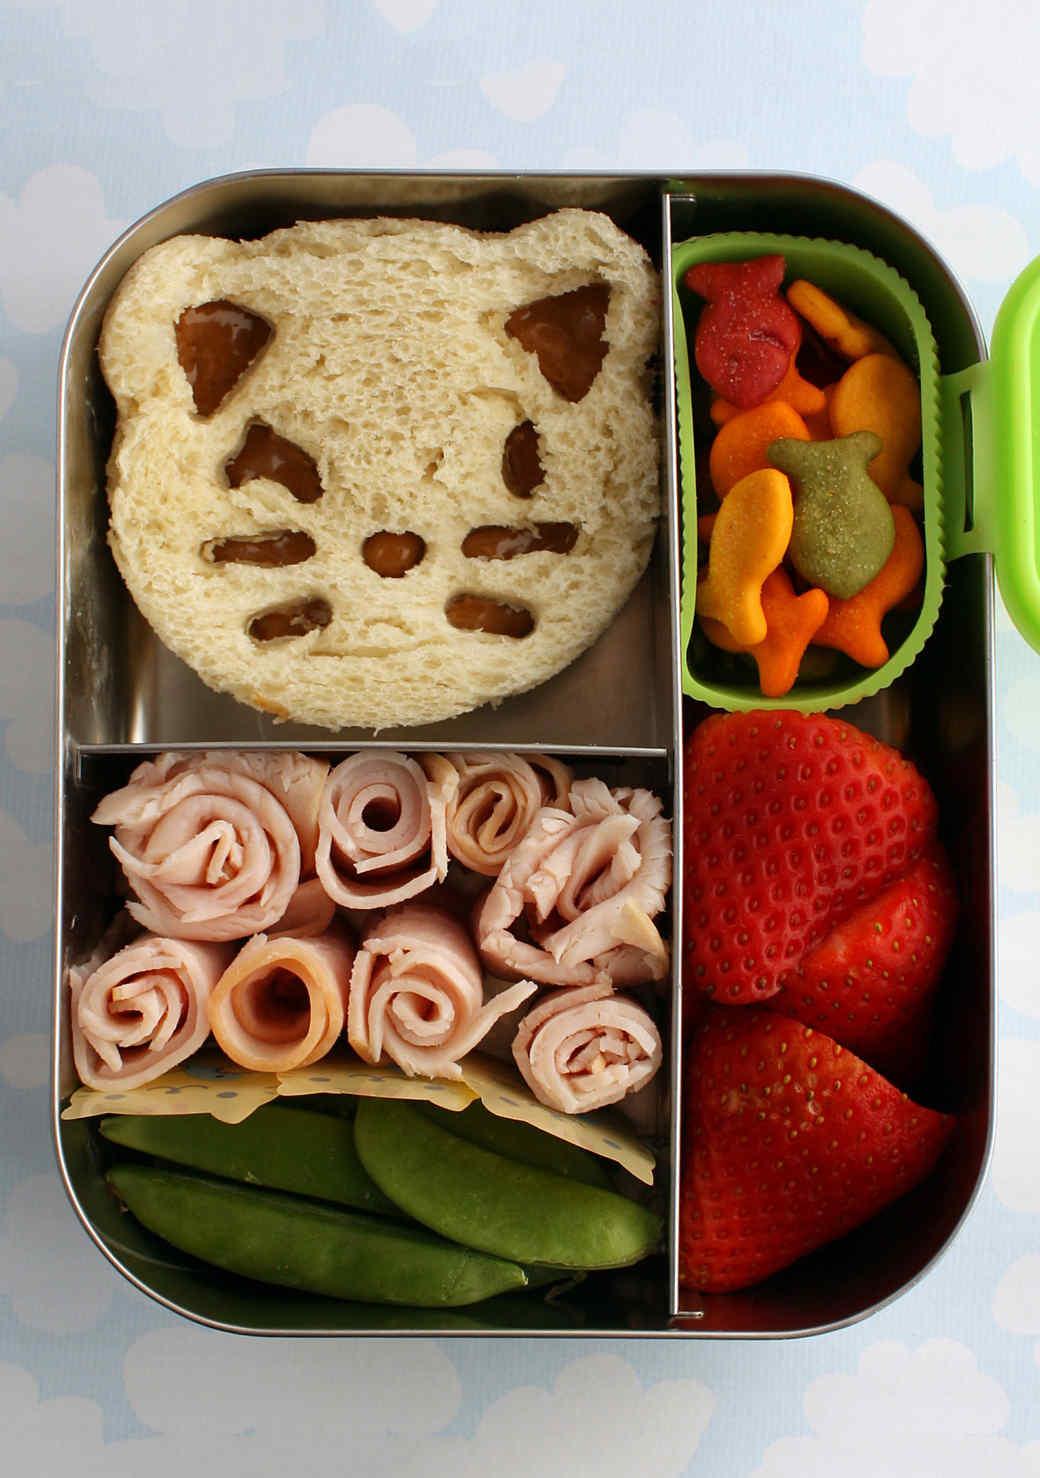 jam-ham-nut-free-lunch.jpg (skyword:335934)